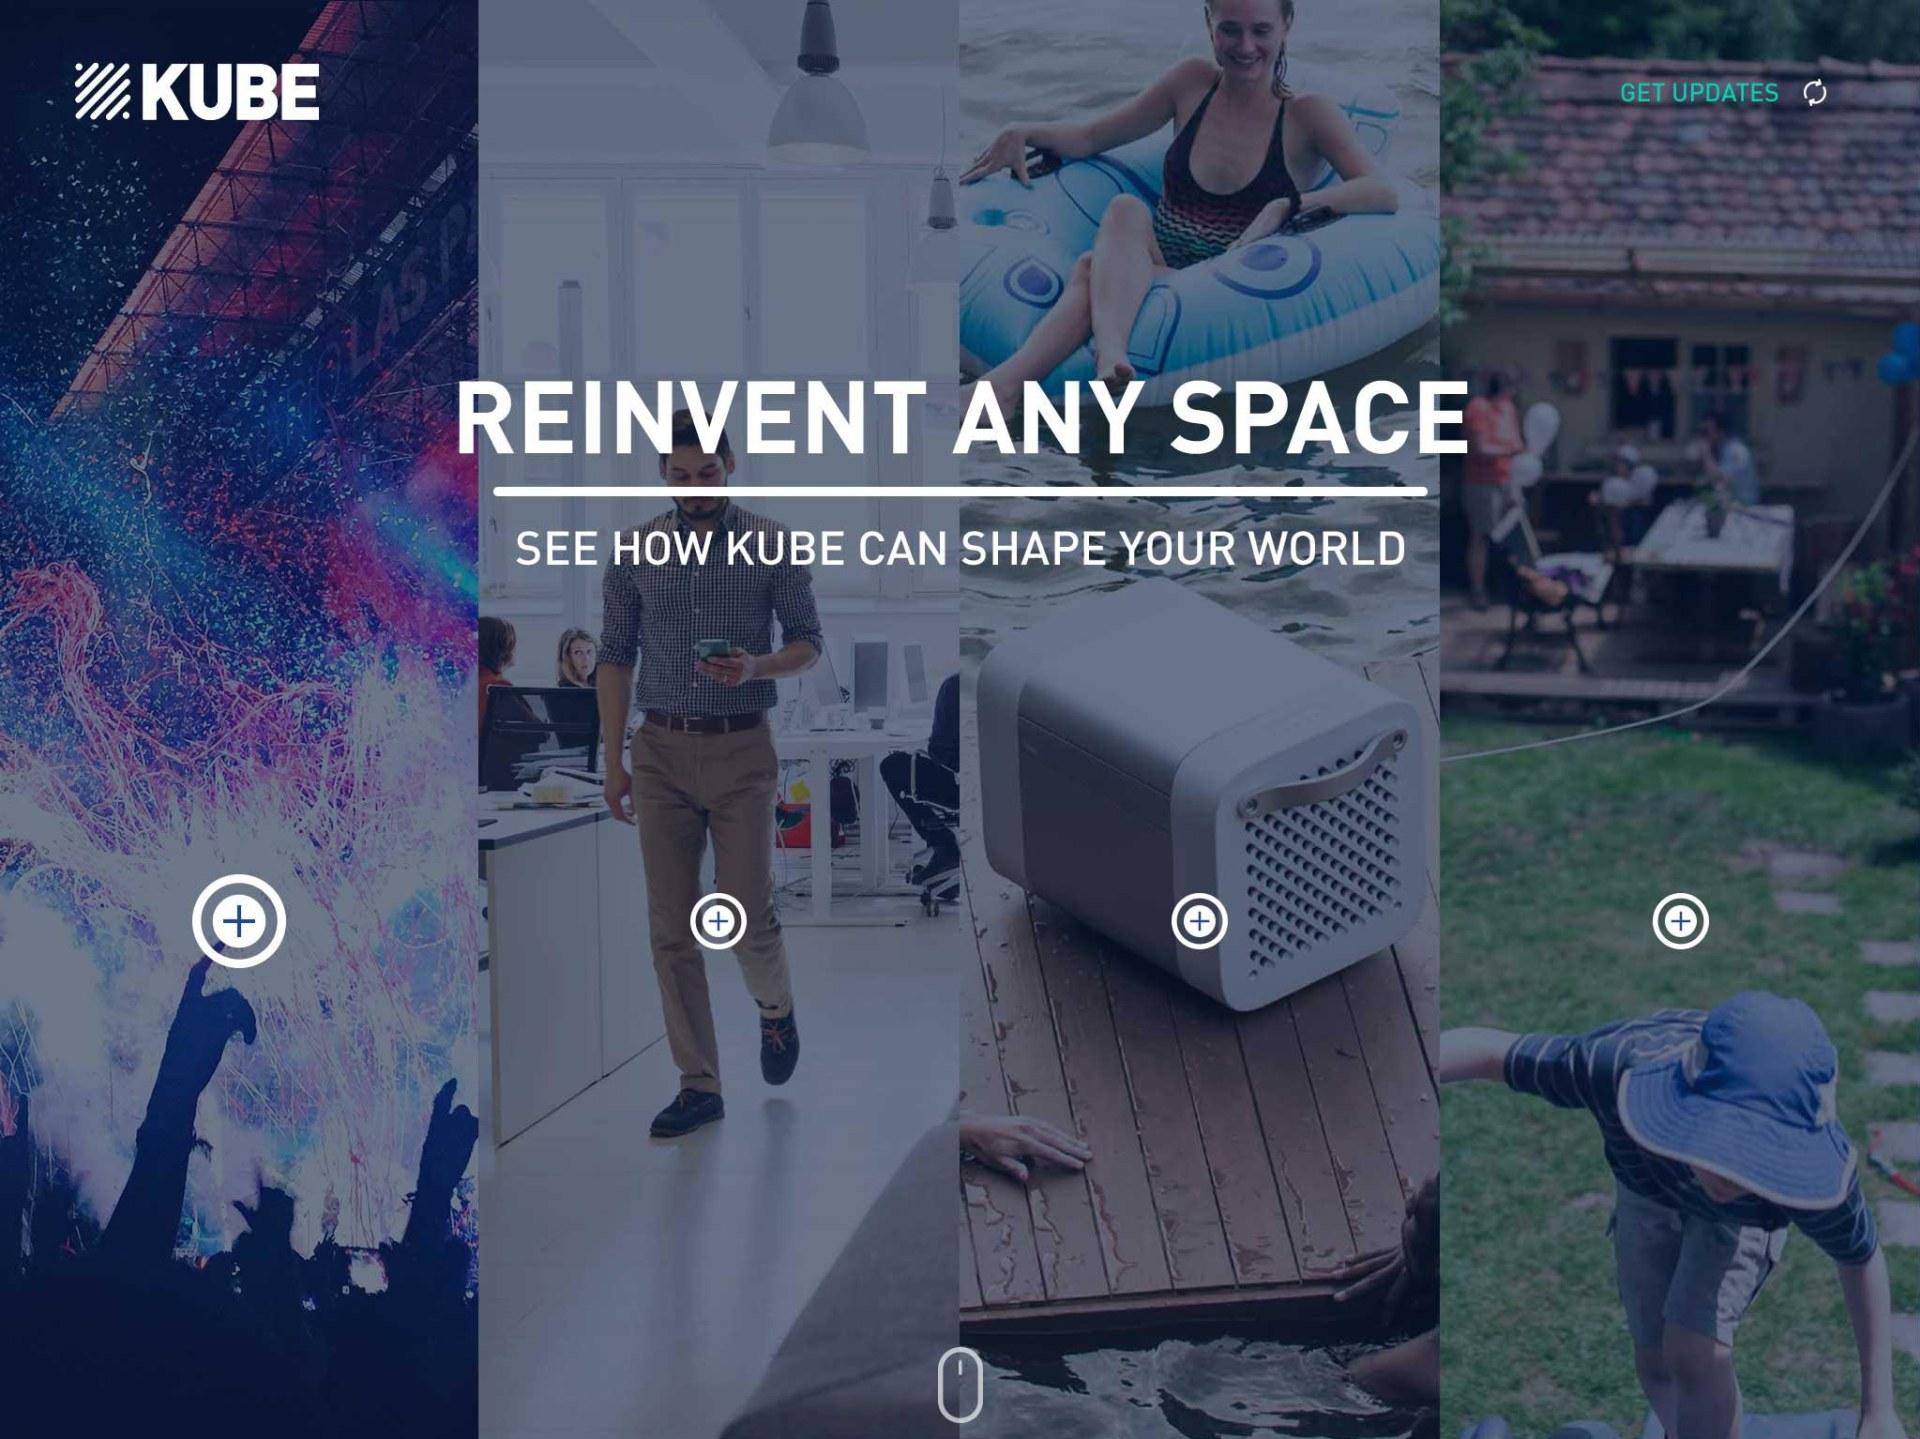 4-pane split, to showcase scenarios with KUBE Rocksauce Studios